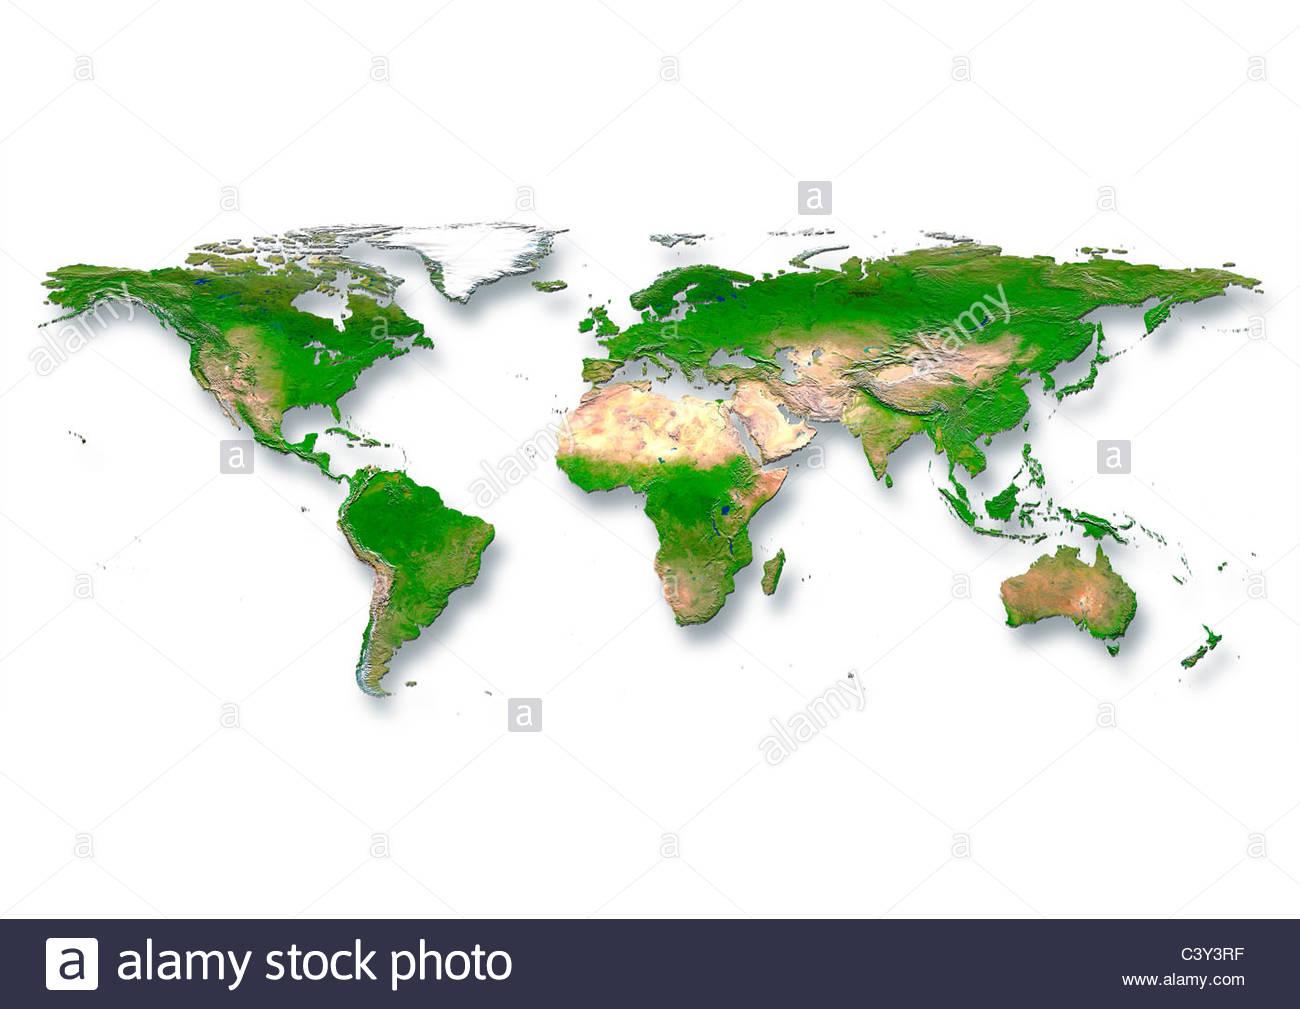 map, world, europe centered, physical, white - Stock Image